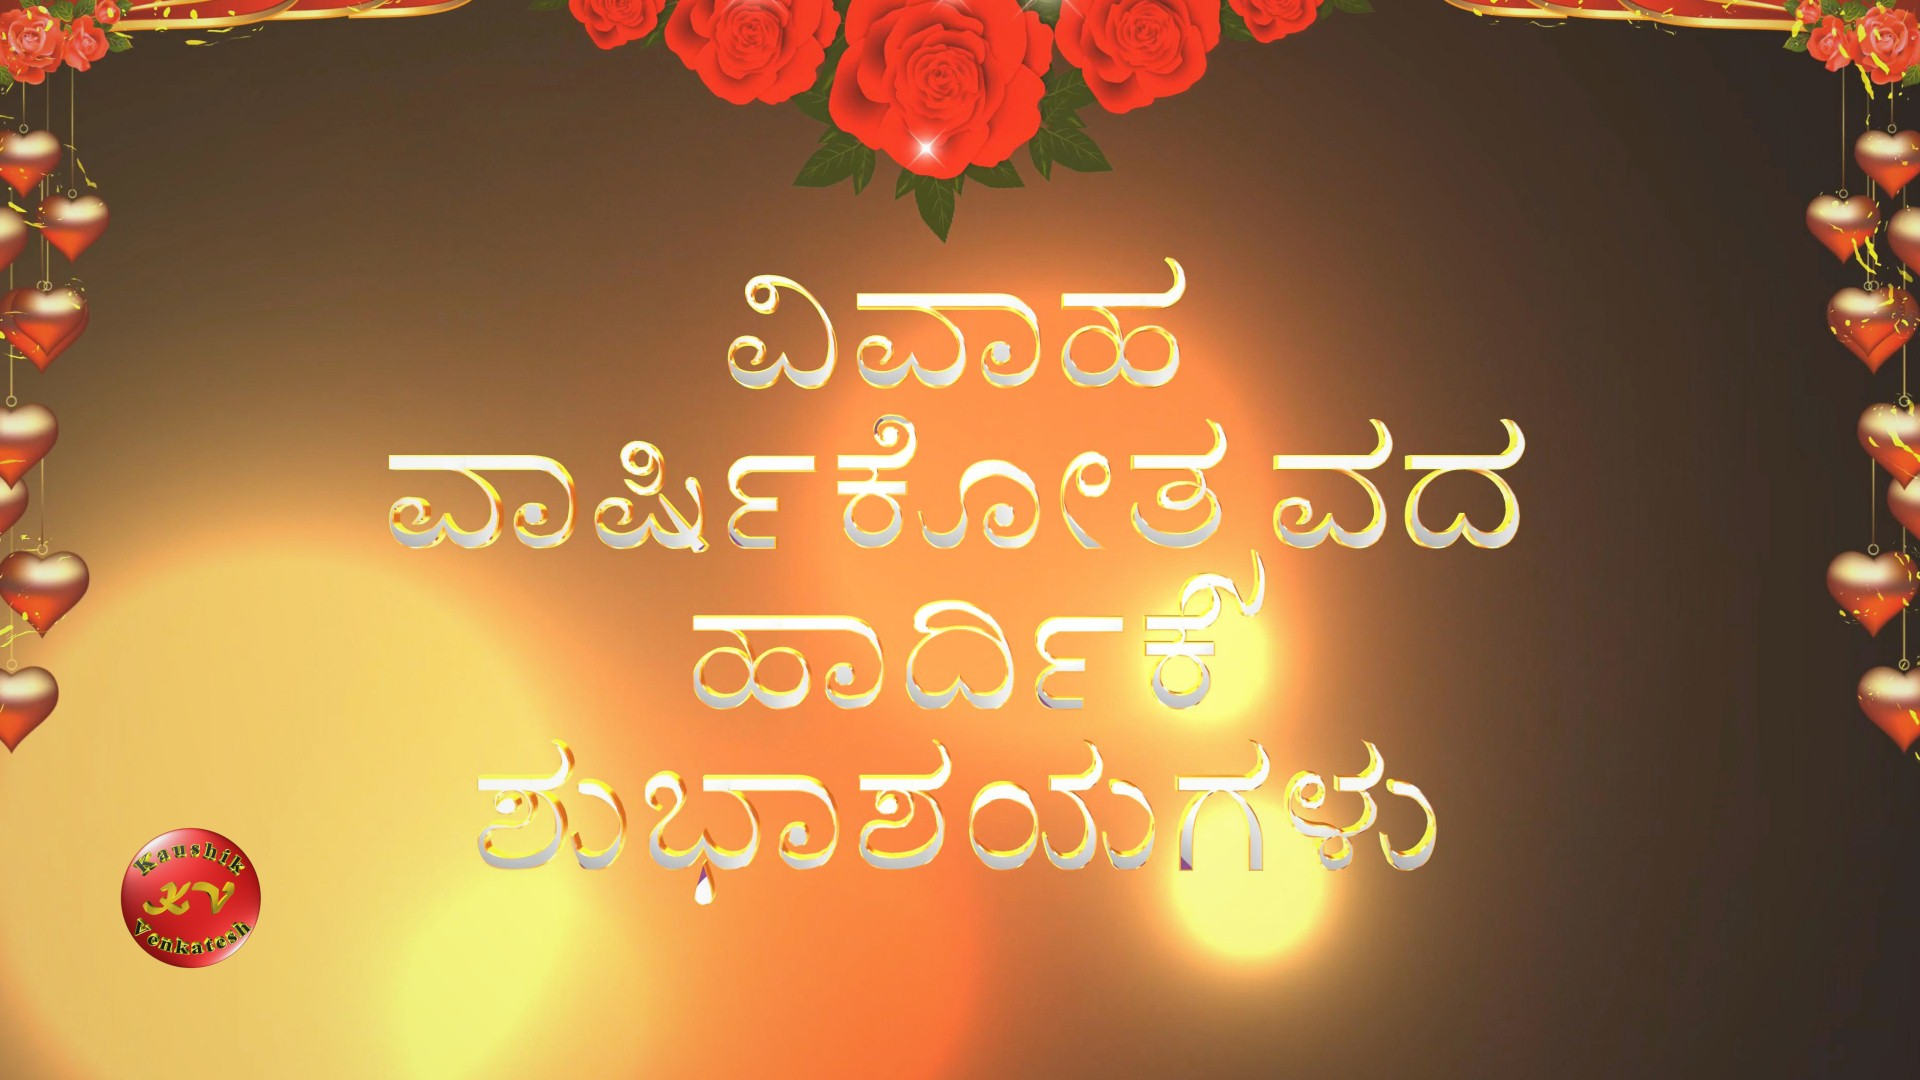 Greetings Image of Happy Wedding Anniversary Wishes in Kannada